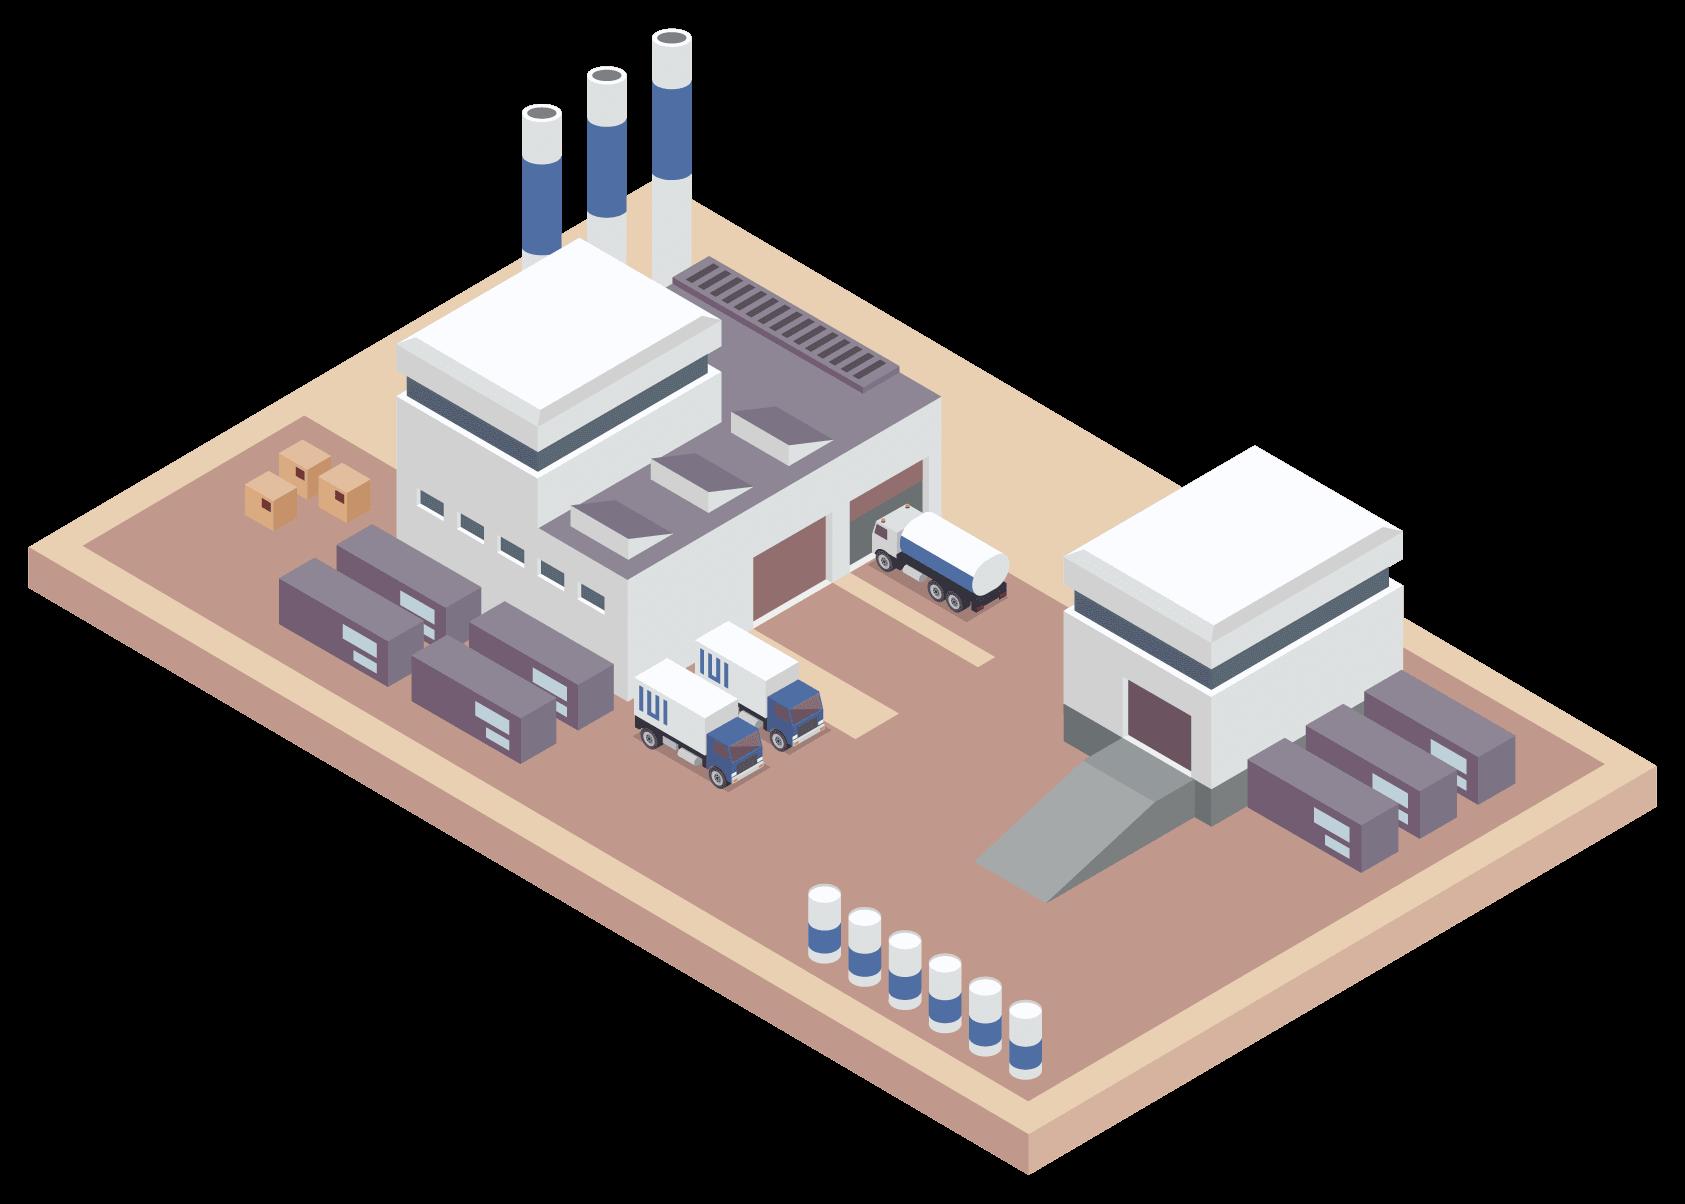 industria-sap-hana-spro-iot-tecnologia